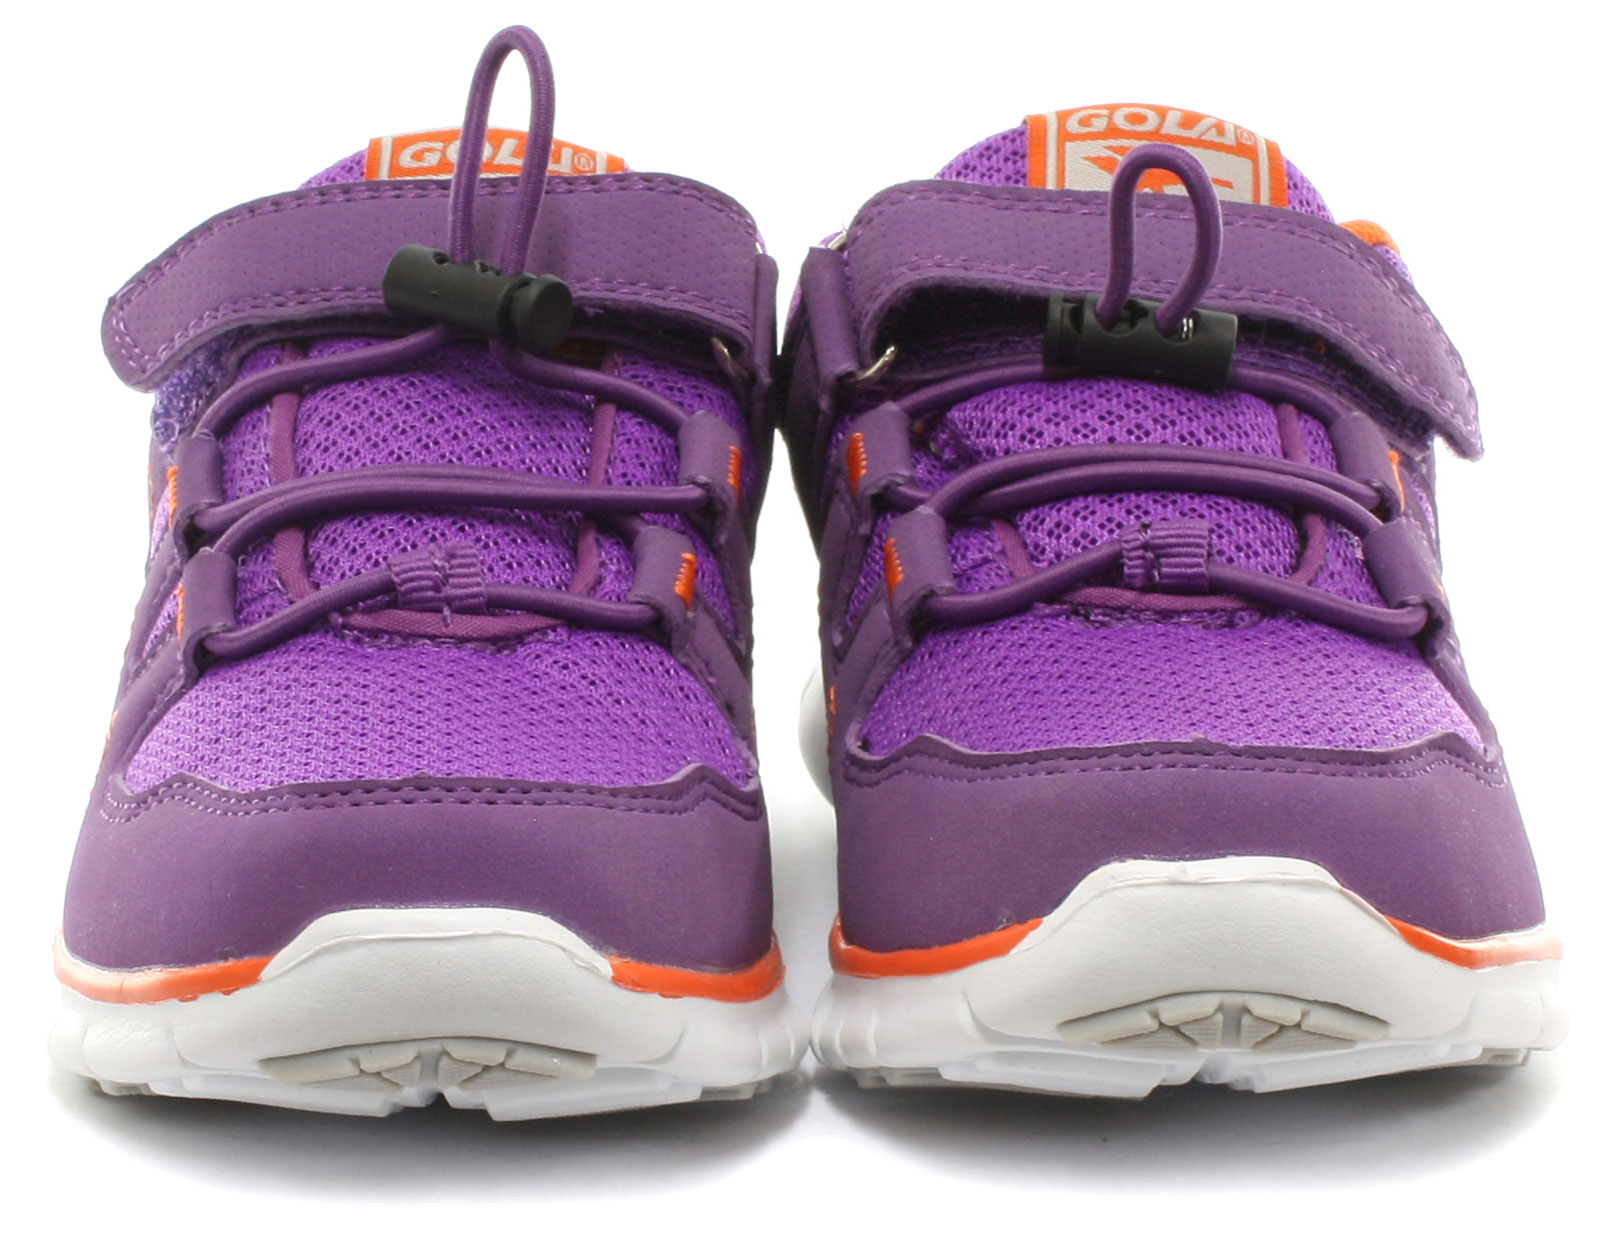 Nuevo Gola Termas alternar Púrpura Niños Fitness Zapatillas Size UK 12 (UE 31)